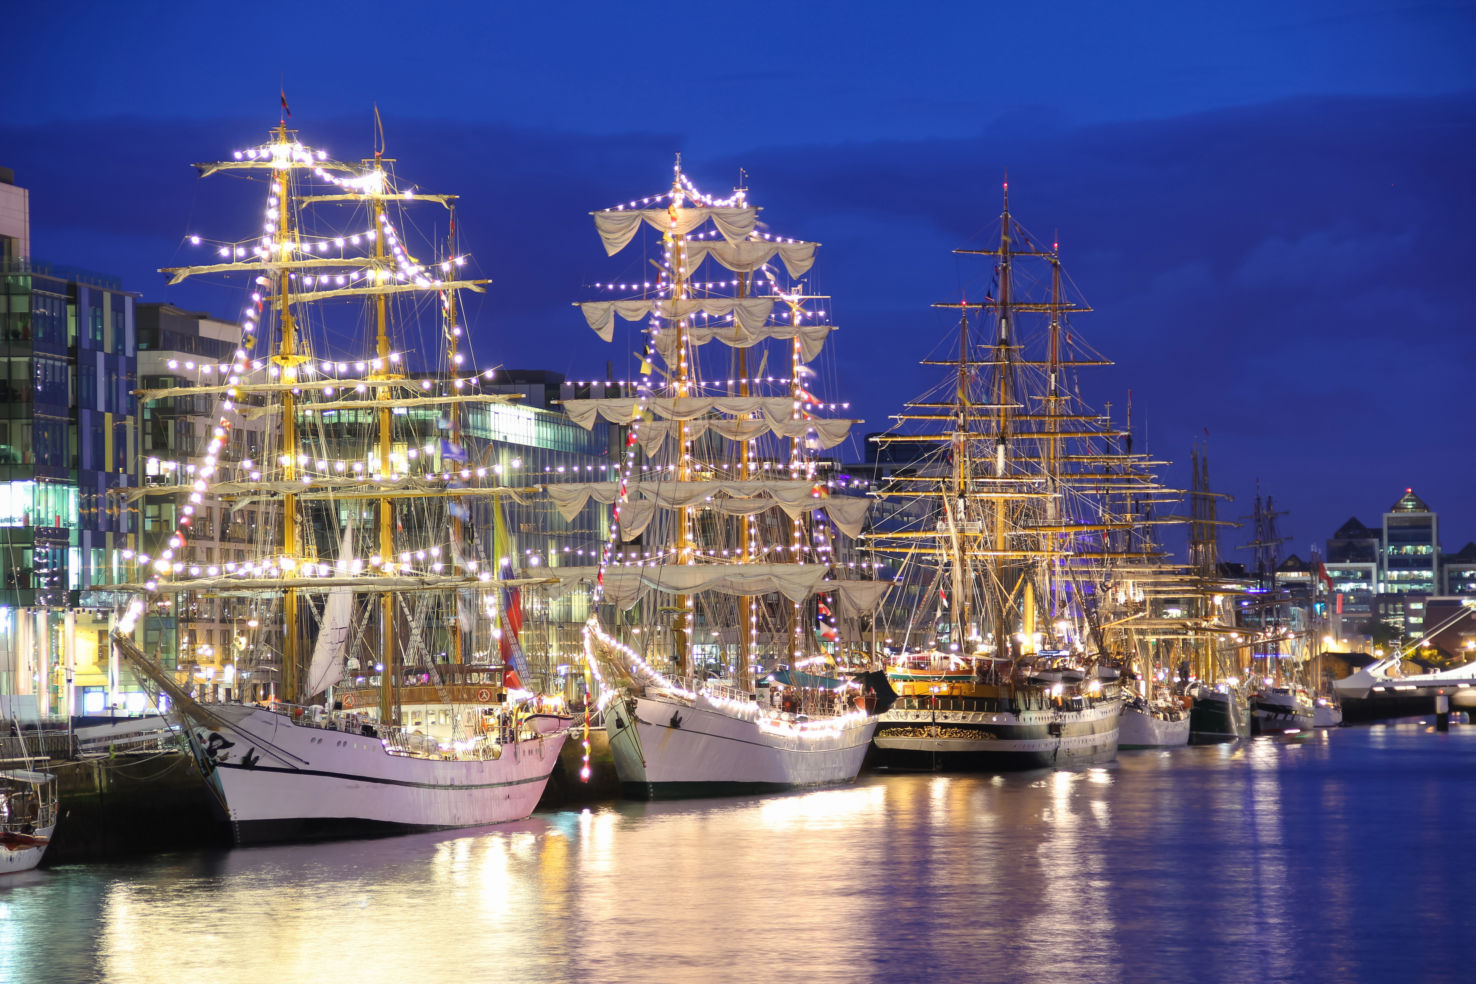 Tall ships, Liffey river, Dublin, Ireland